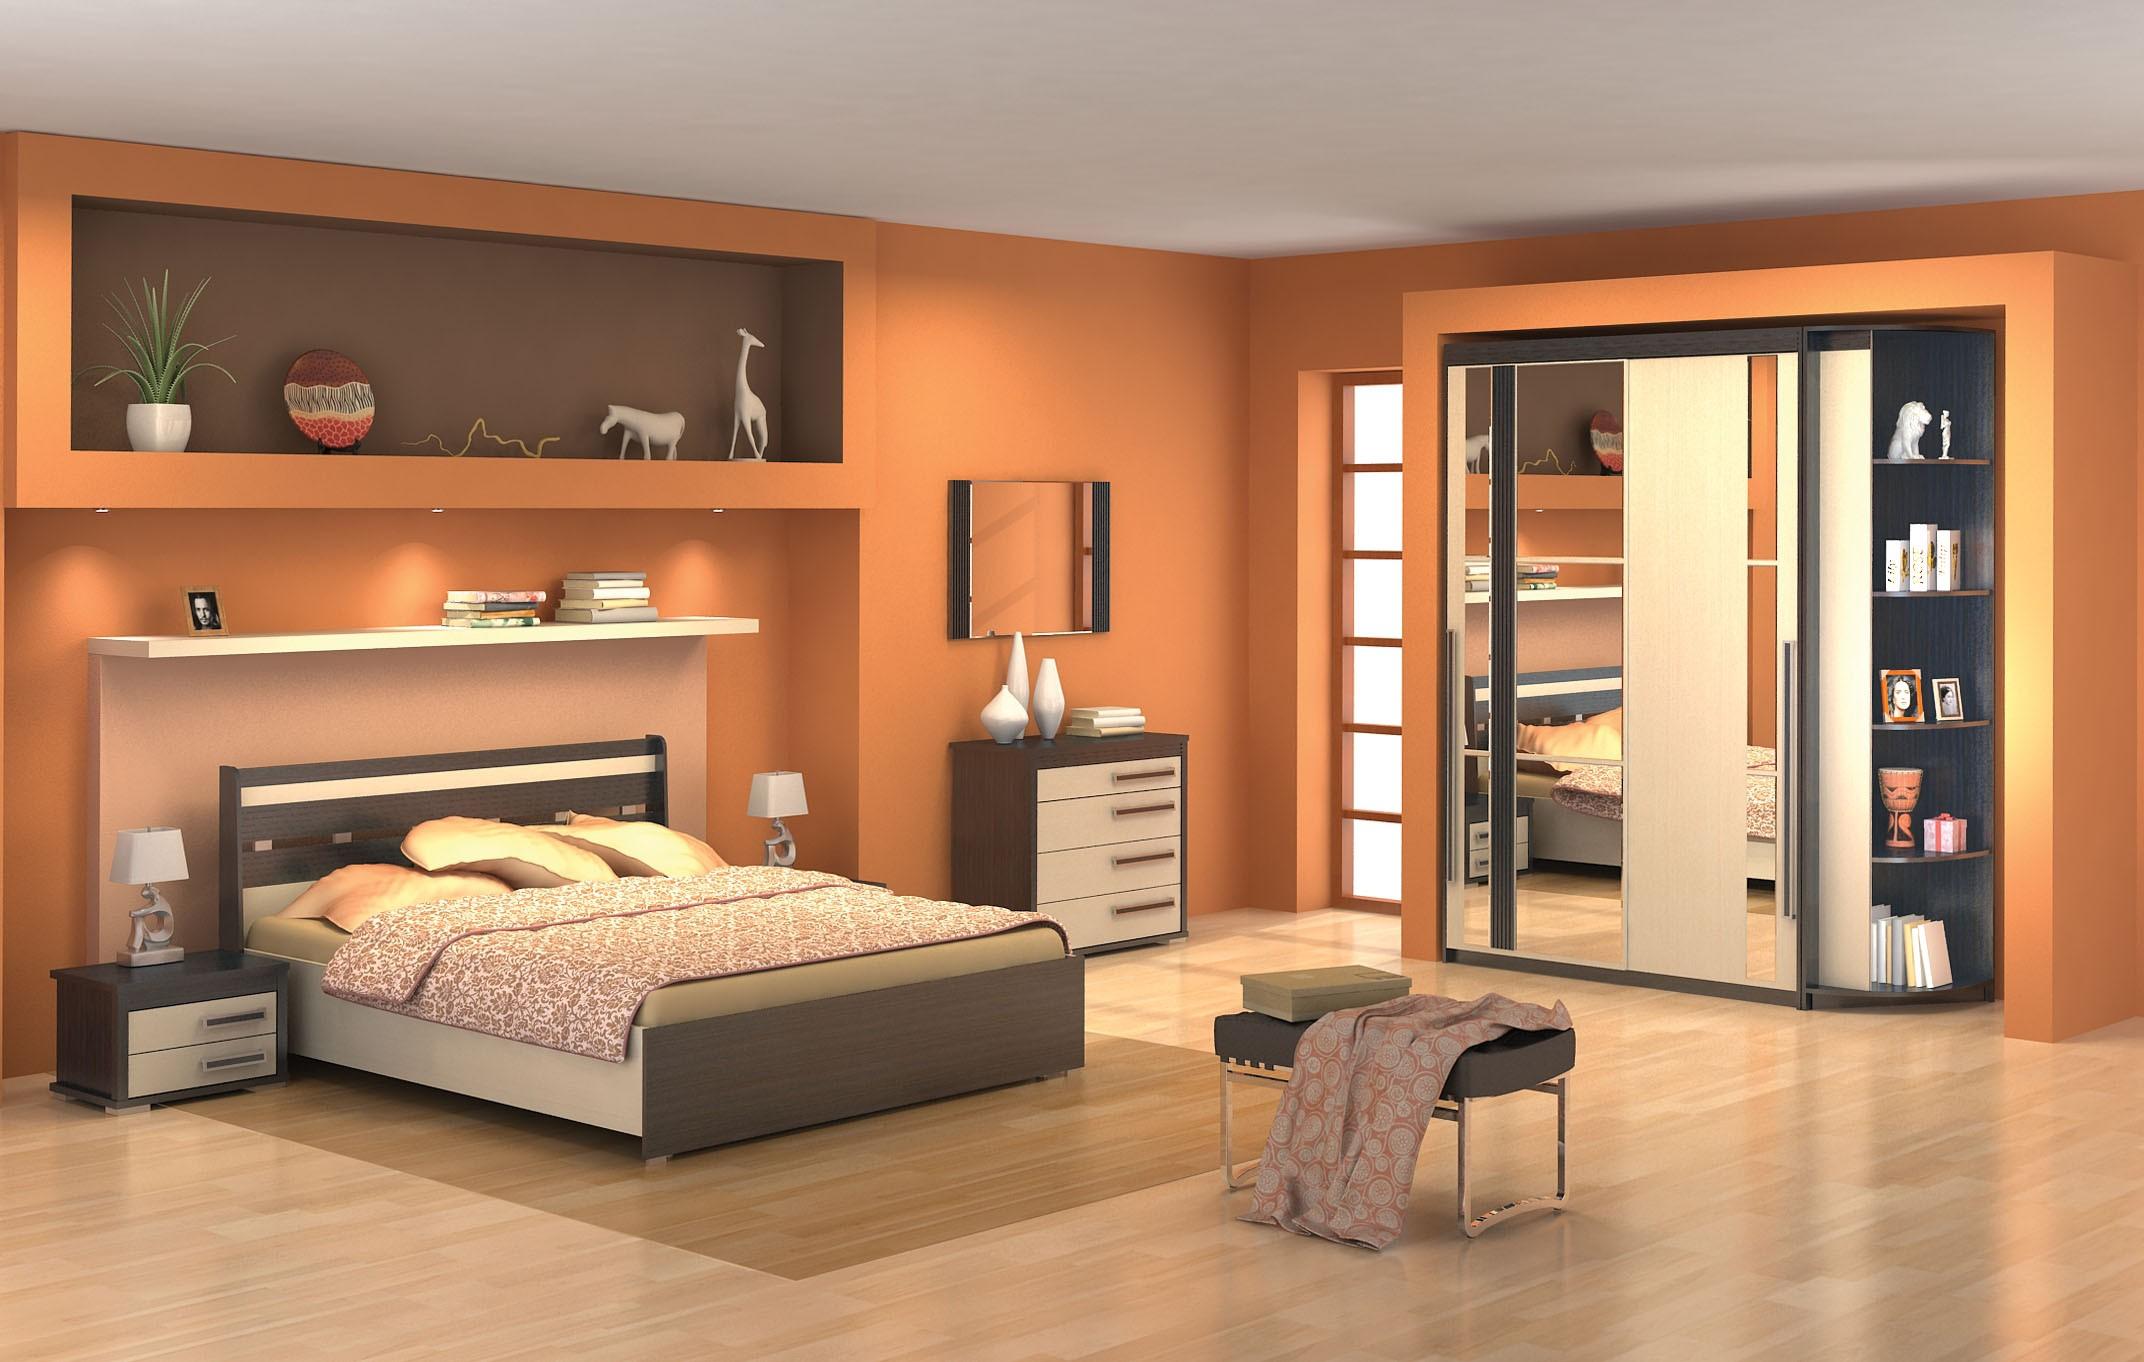 Спальный гарнитур модерн фото мебели, каталог мебели, мебель.